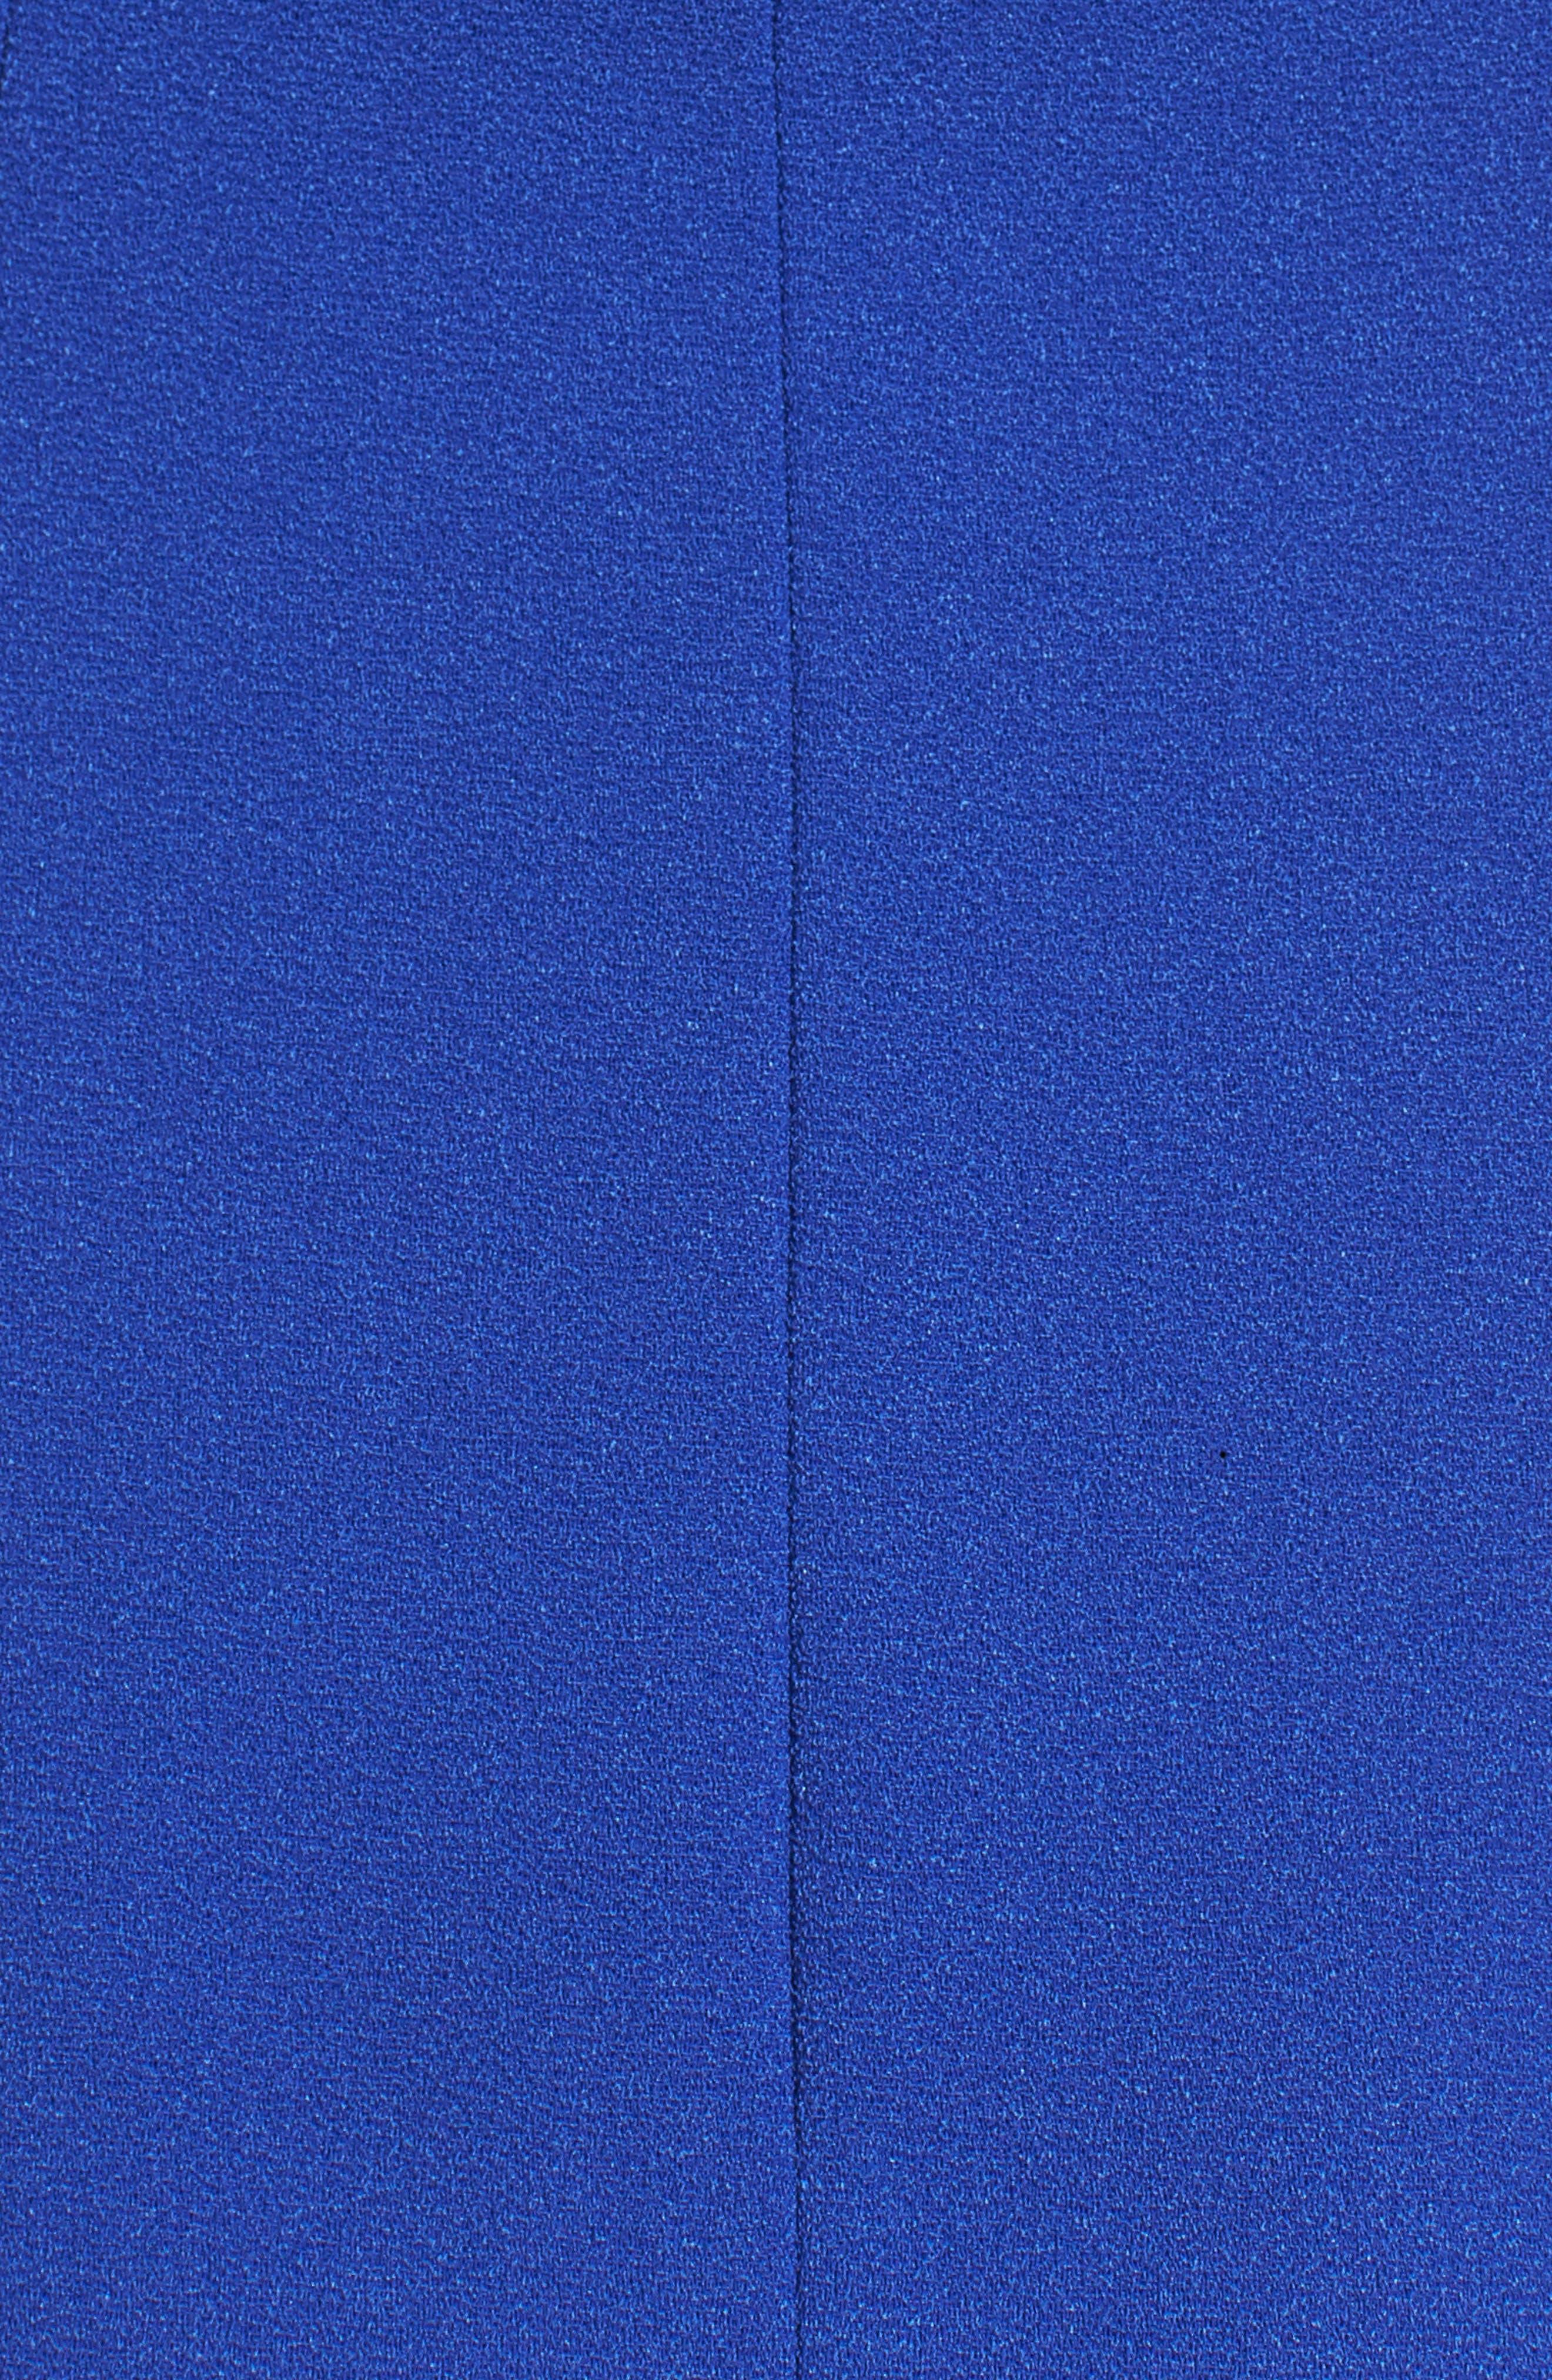 Imasira Sleeveless Top,                             Alternate thumbnail 5, color,                             Sailor Blue